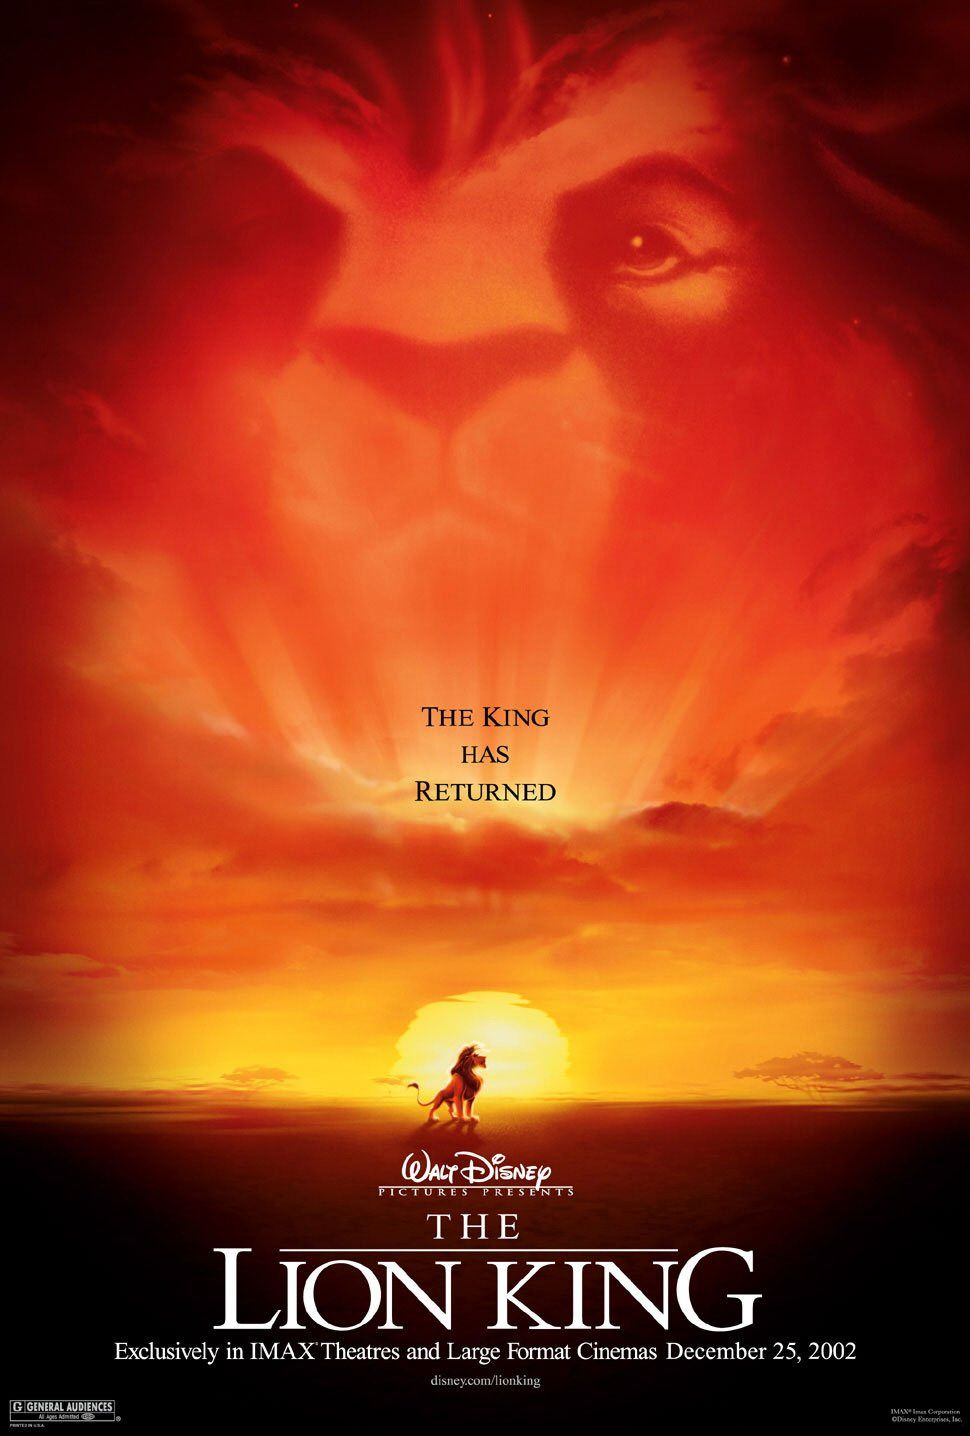 THE LION KING 1994 | BRRIP | 720p | 500 MB